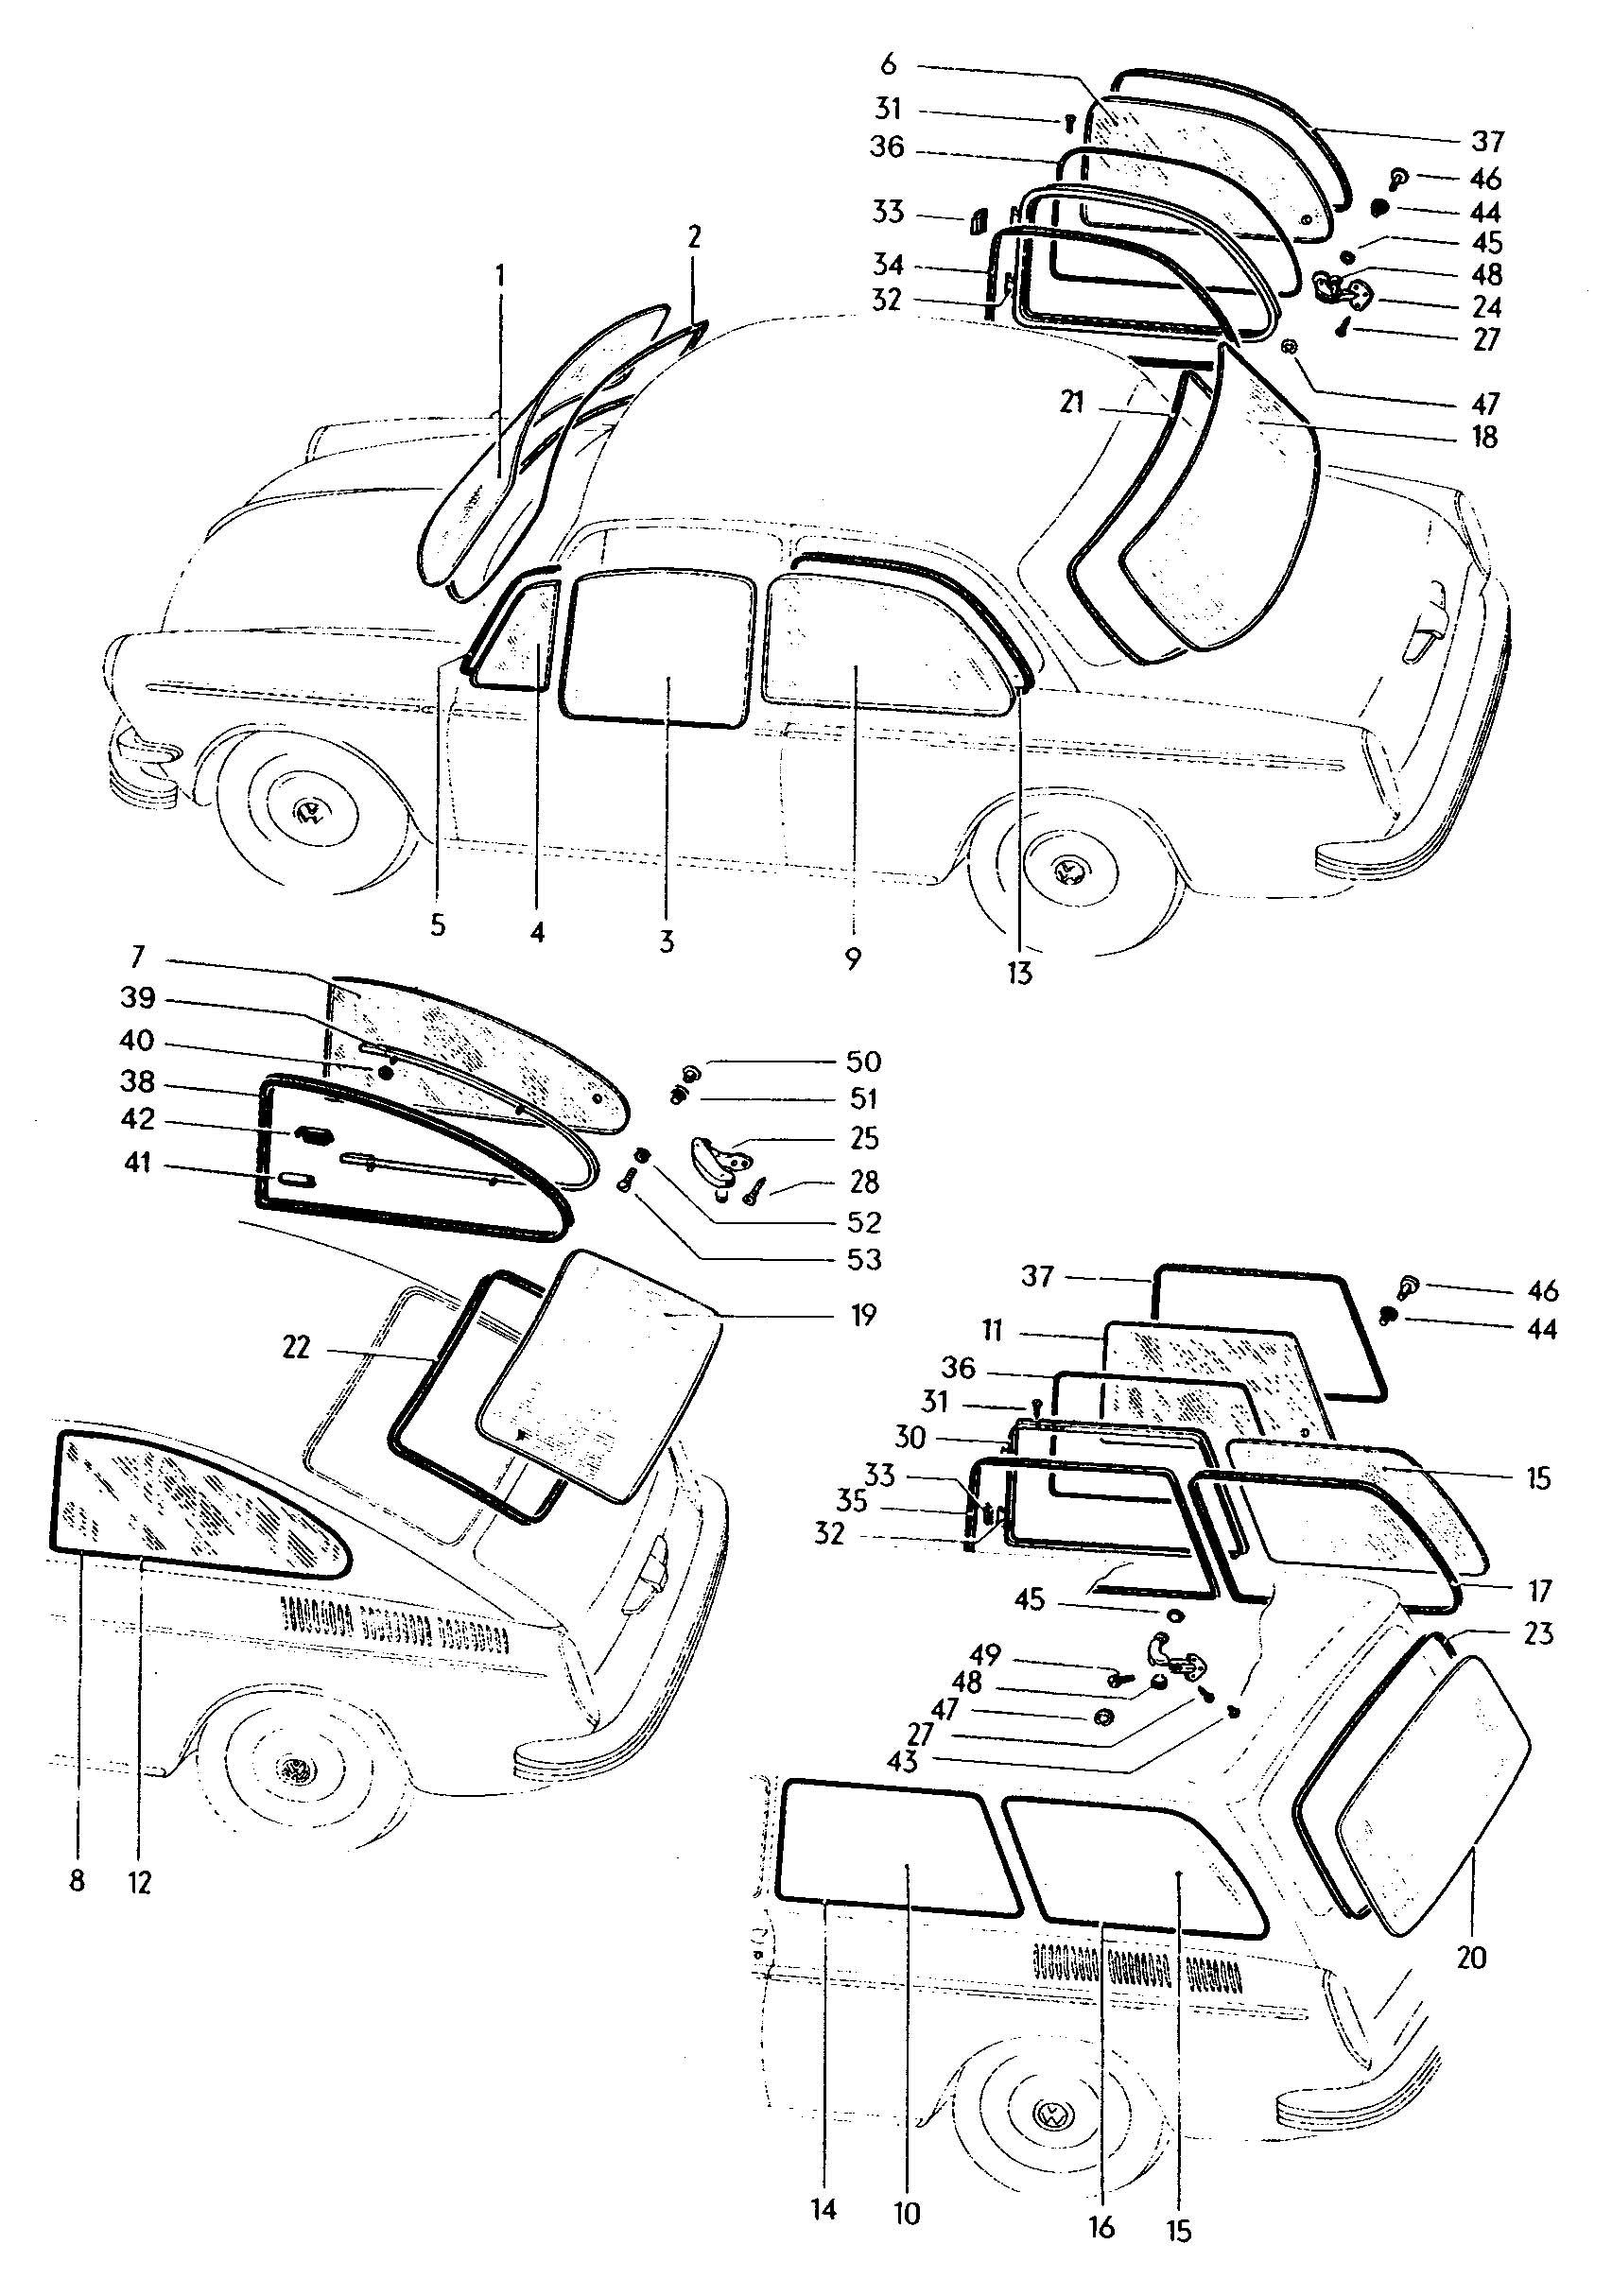 m4 parts illustration